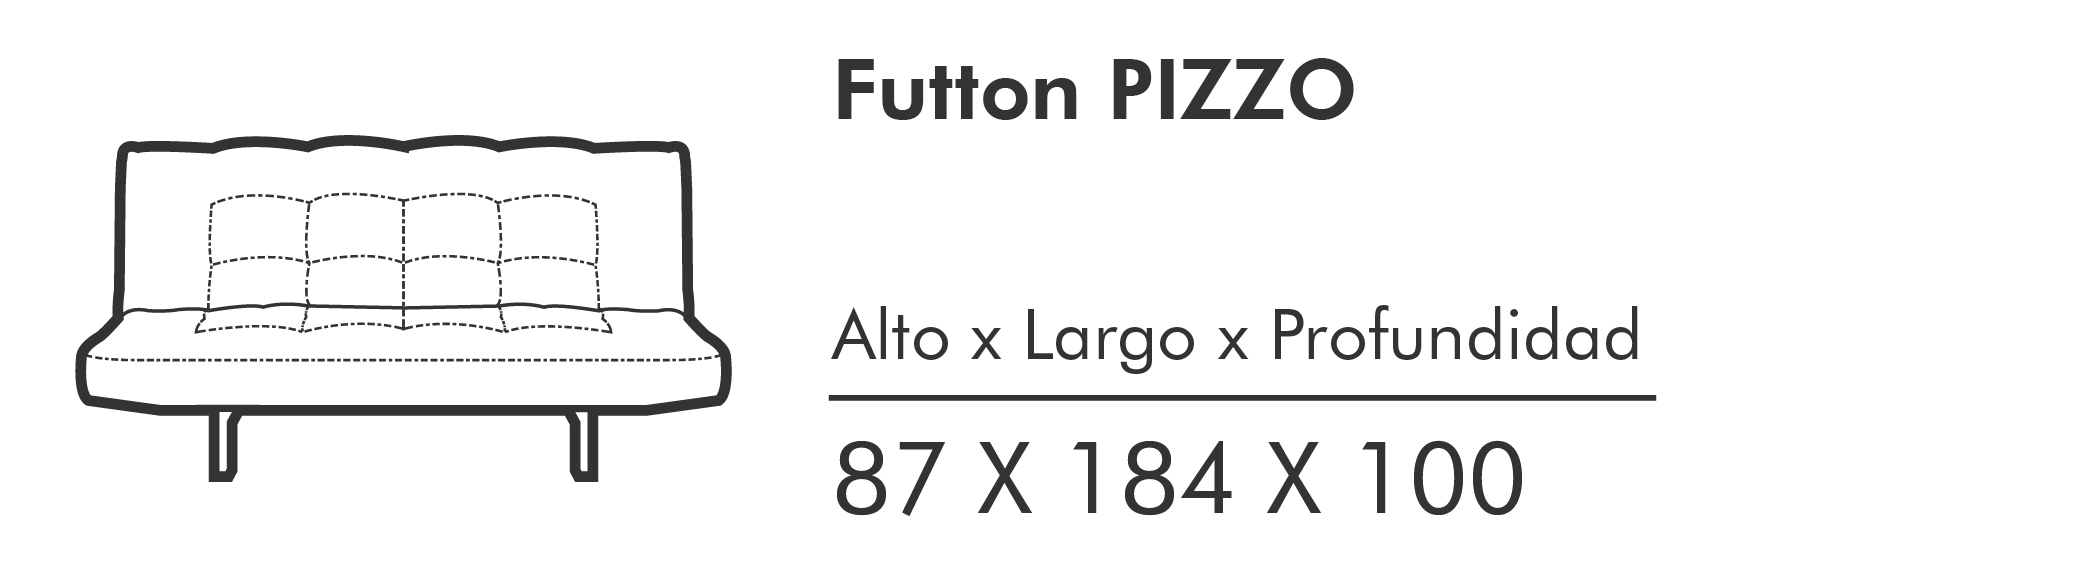 isometrico-futton-pizzo.jpg